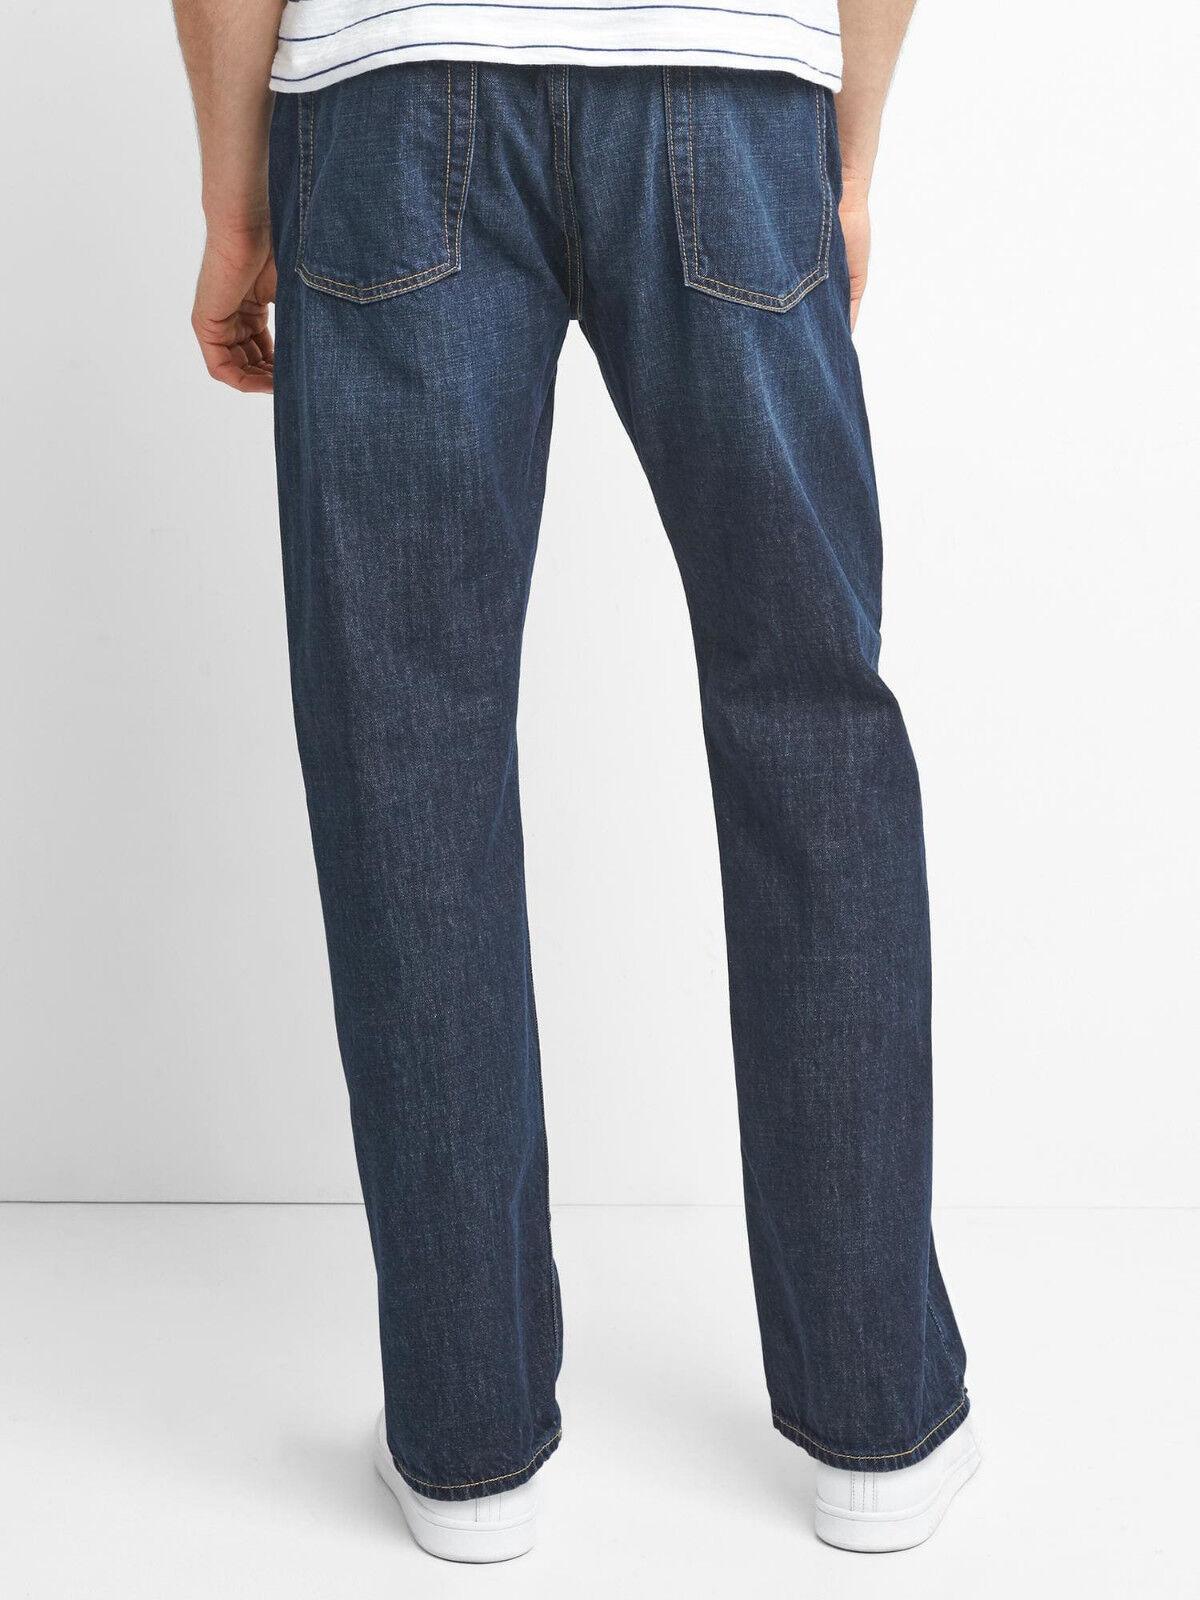 JW Anderson x Uniqlo Men's JWA Vintage Straight Jeans Kaihara Denim NEW 33x34